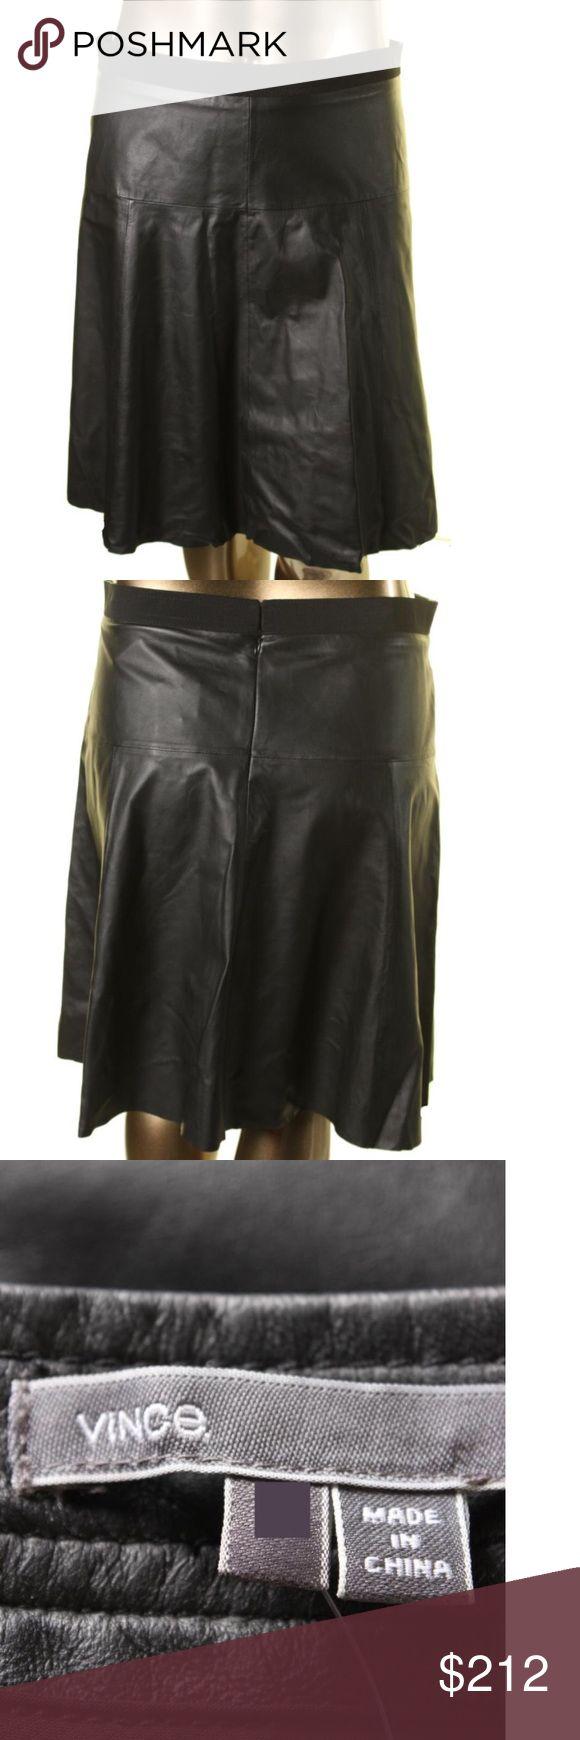 VINCE $695* Black Lamb Leather A-Line Skirt VINCE Black Lamb Leather Knee-Length A-Line Skirt Vince Skirts A-Line or Full